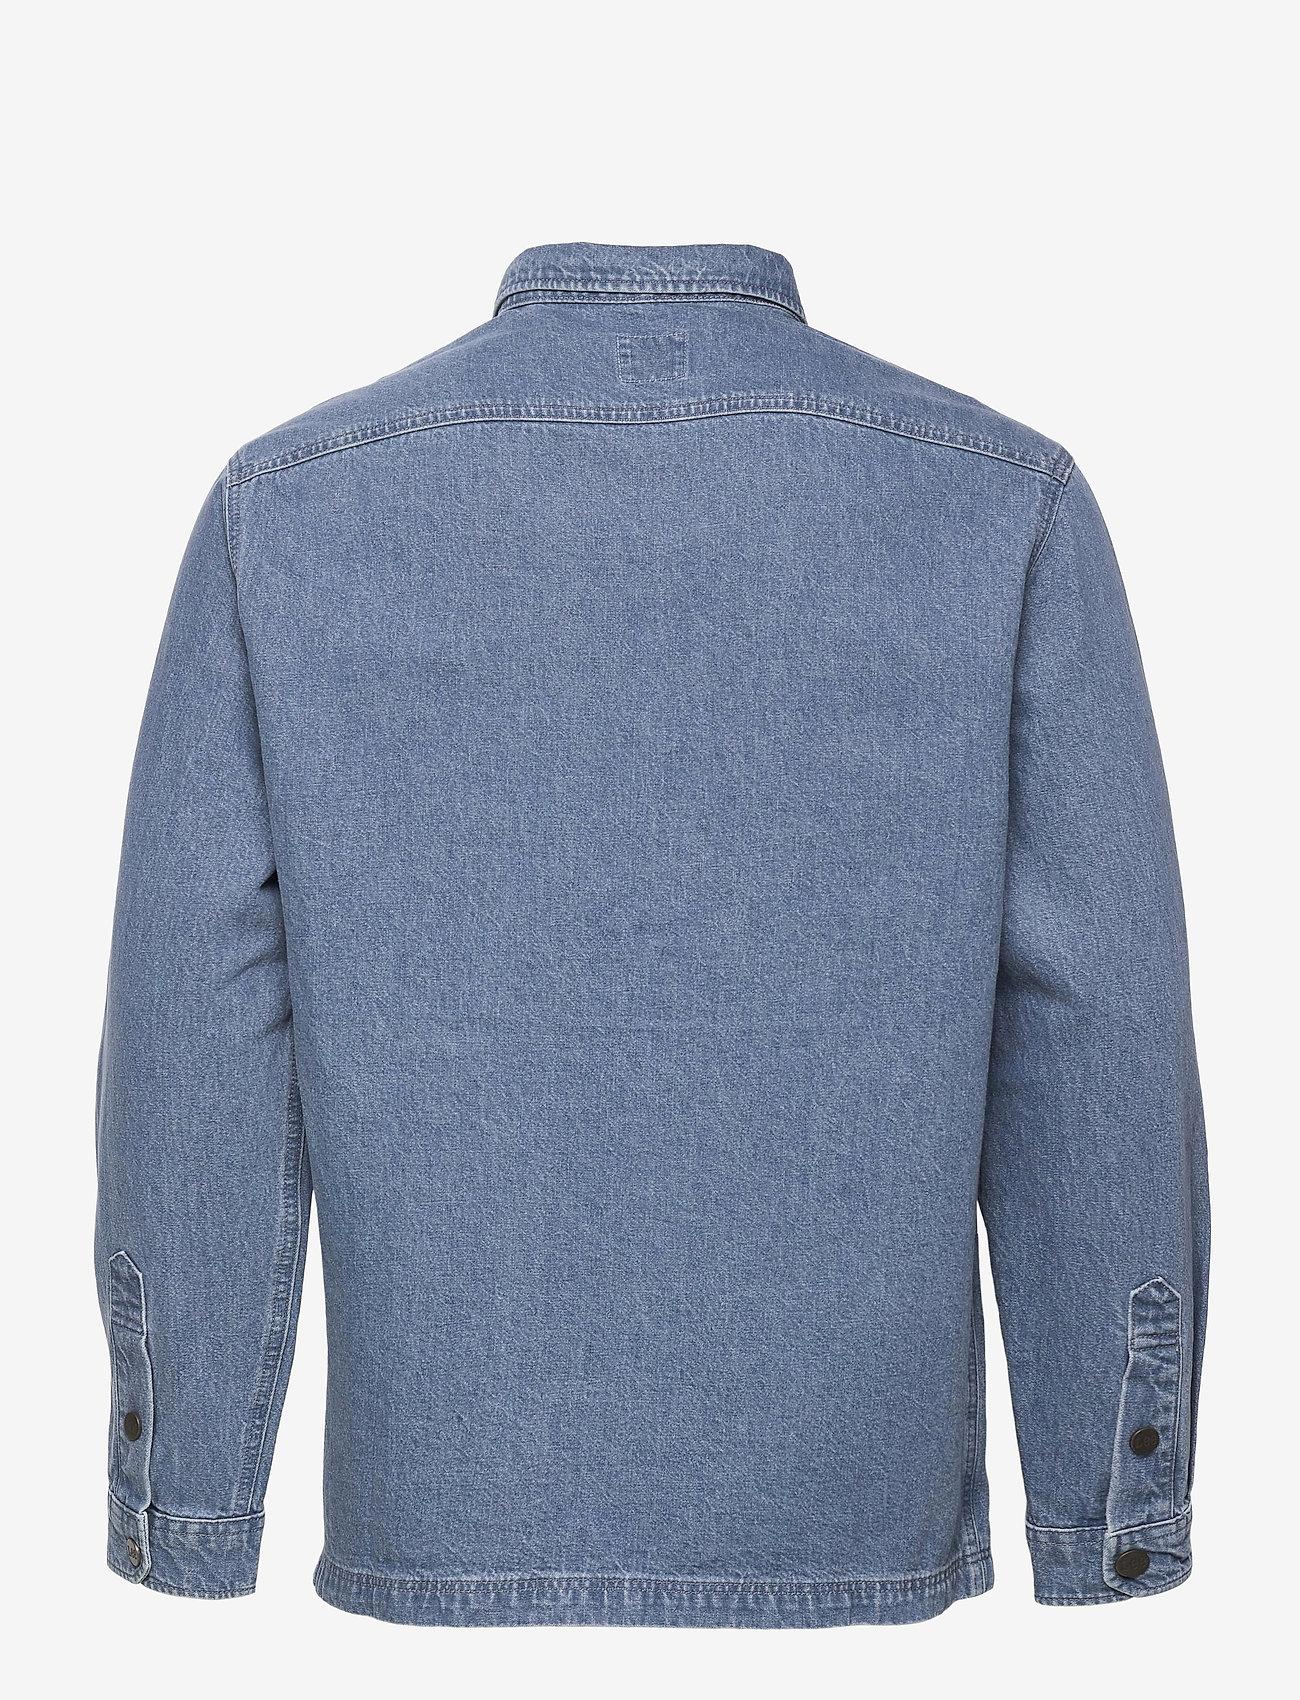 Lee Jeans - WORKWEAR OVERSHIRT - tops - grey bala - 1